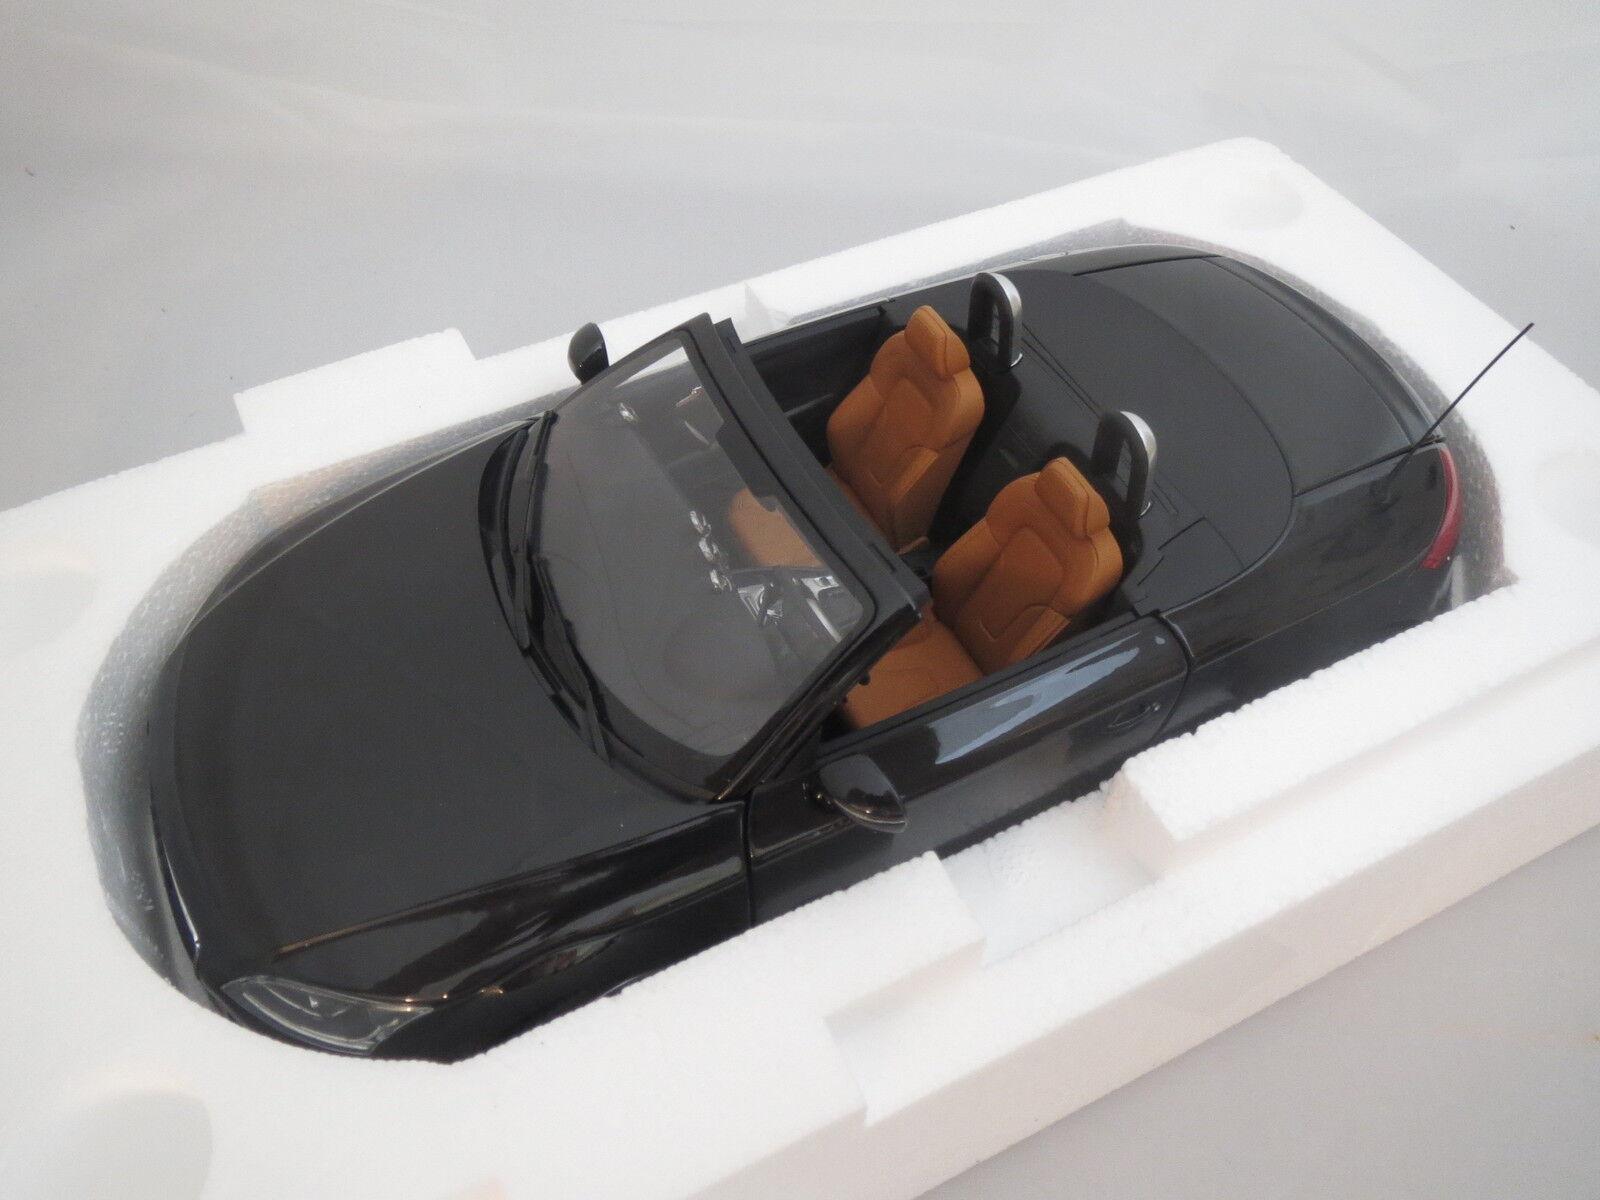 Minichamps AUDI ttroadster 2006 (Noir métallisé Marron) 1 18 OVP